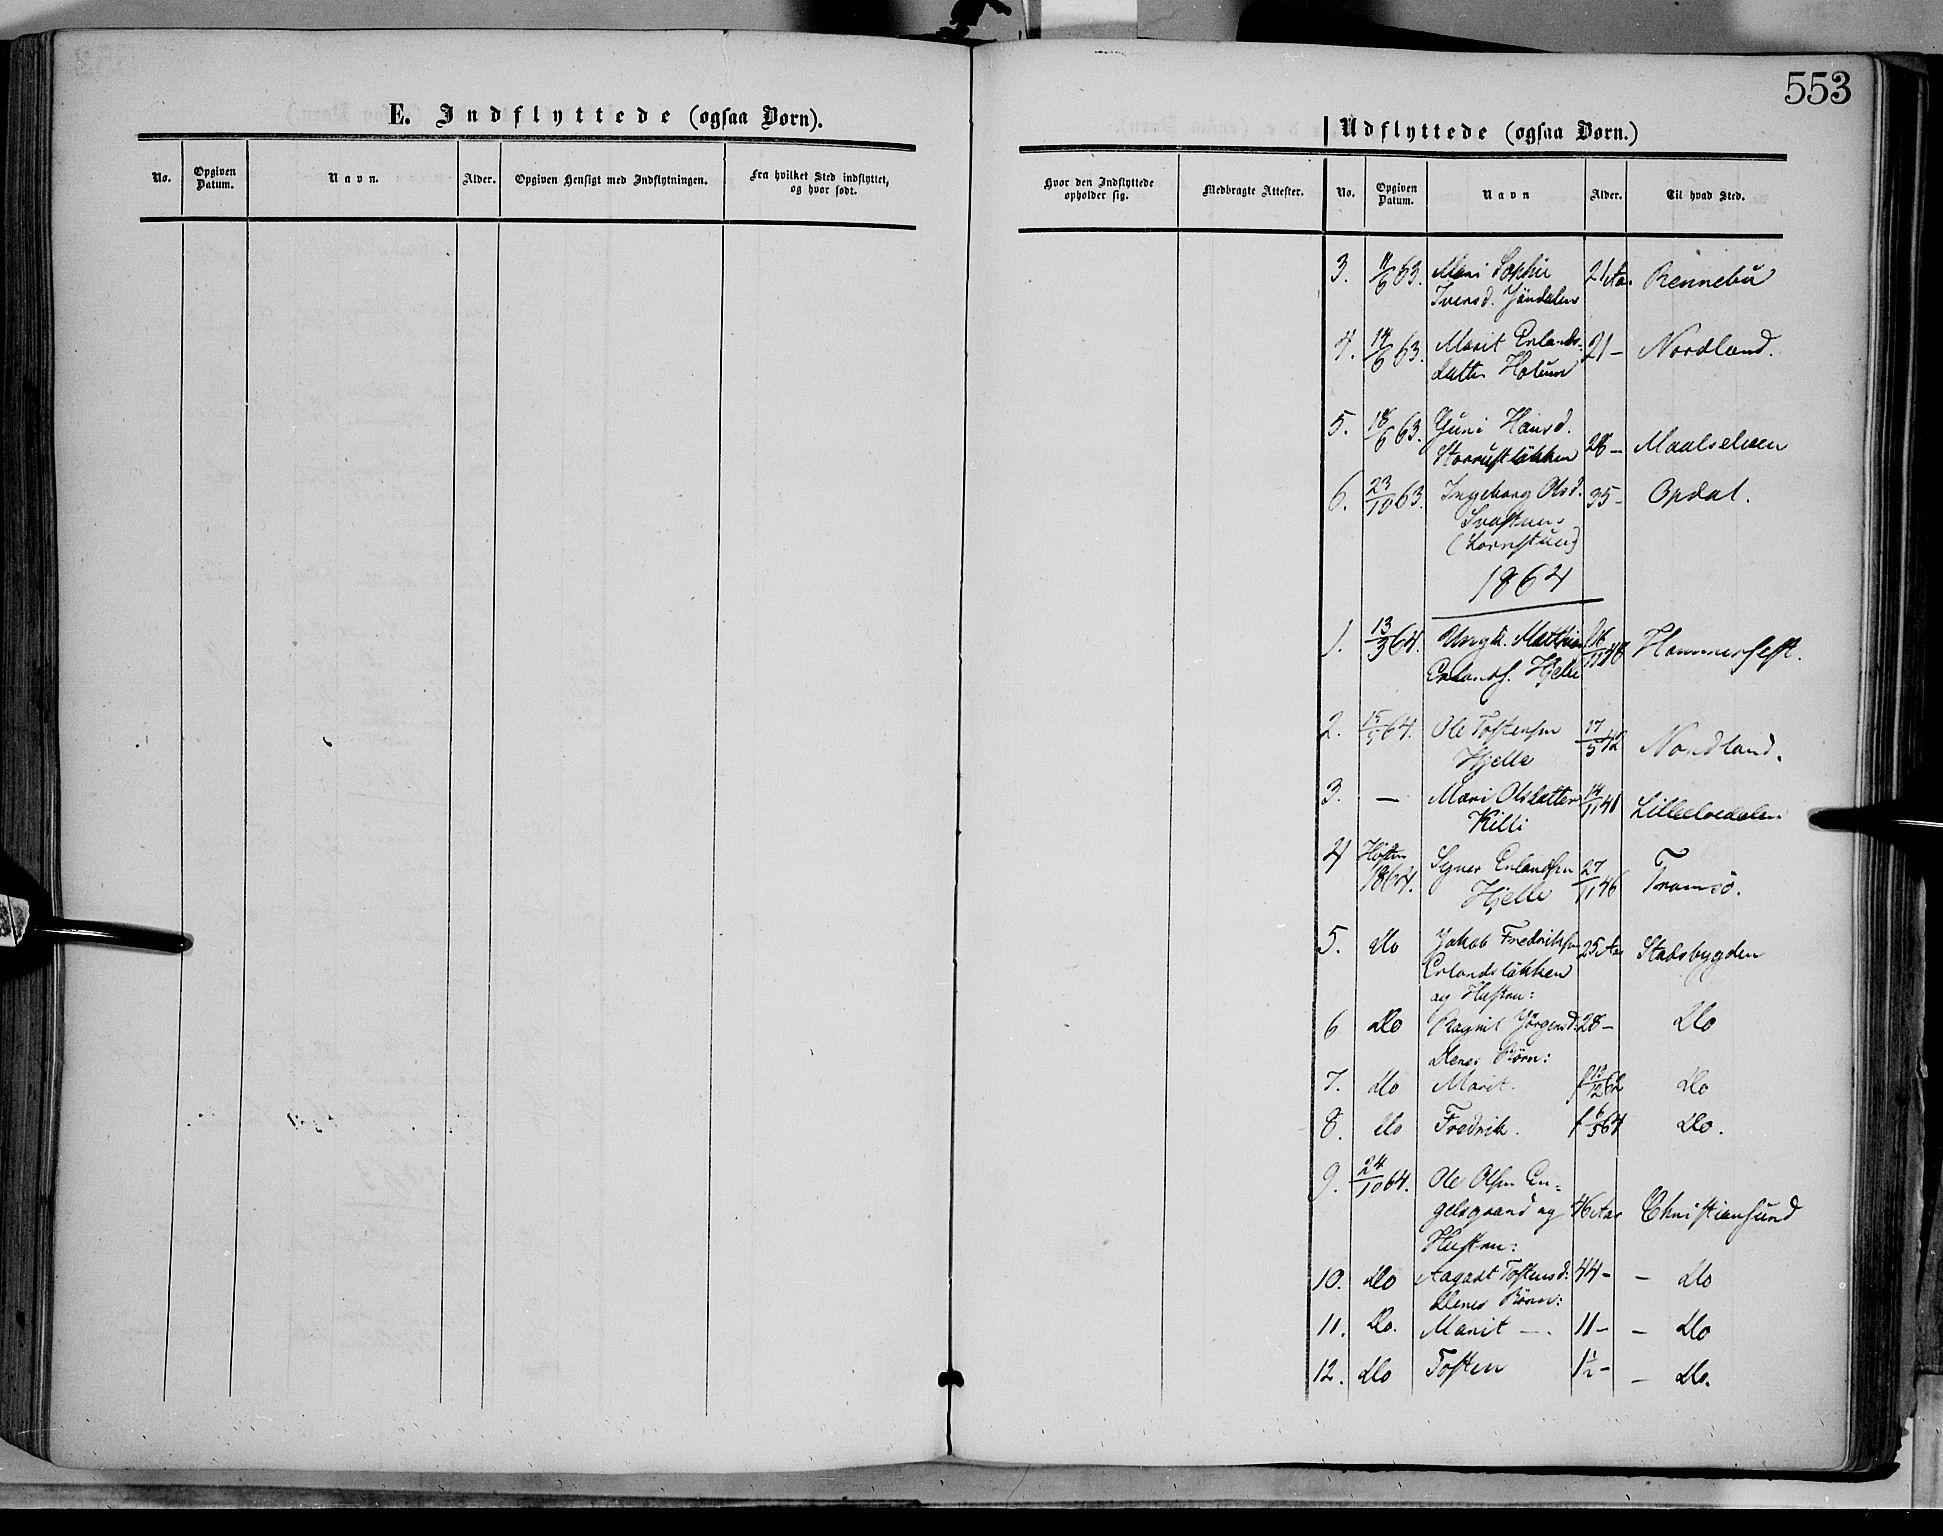 SAH, Dovre prestekontor, Ministerialbok nr. 1, 1854-1878, s. 553